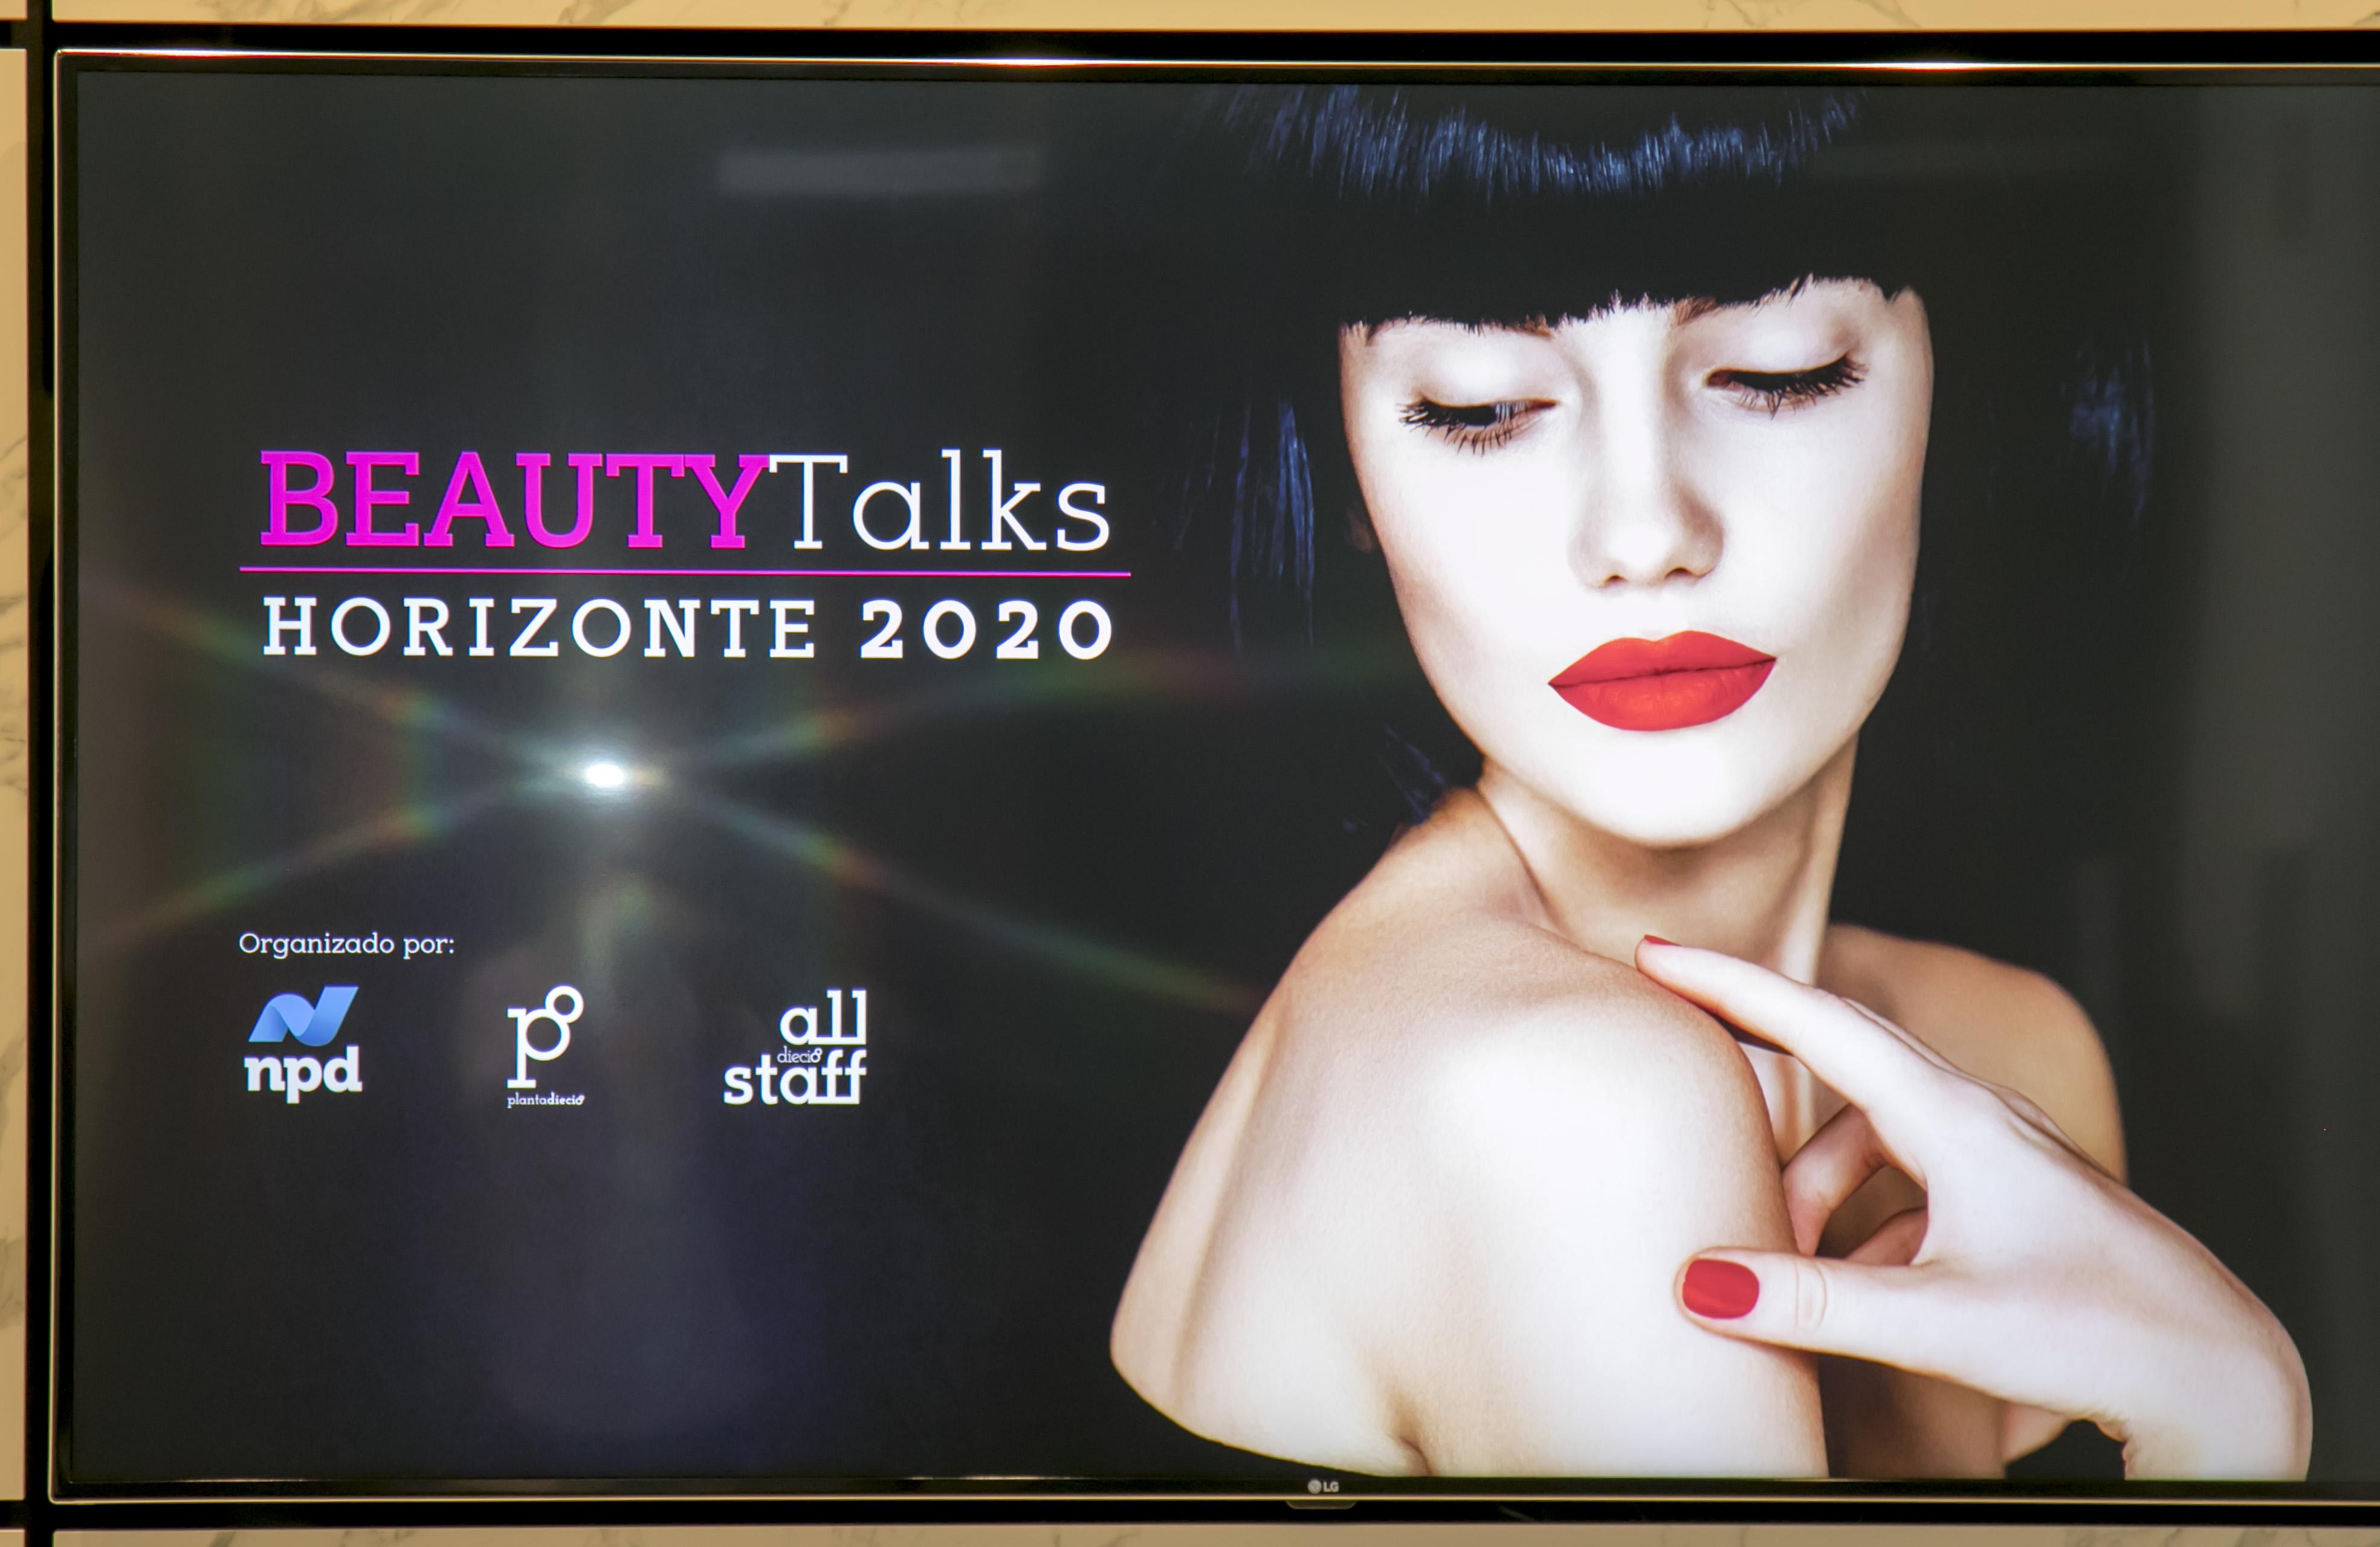 Beauty talks (1)